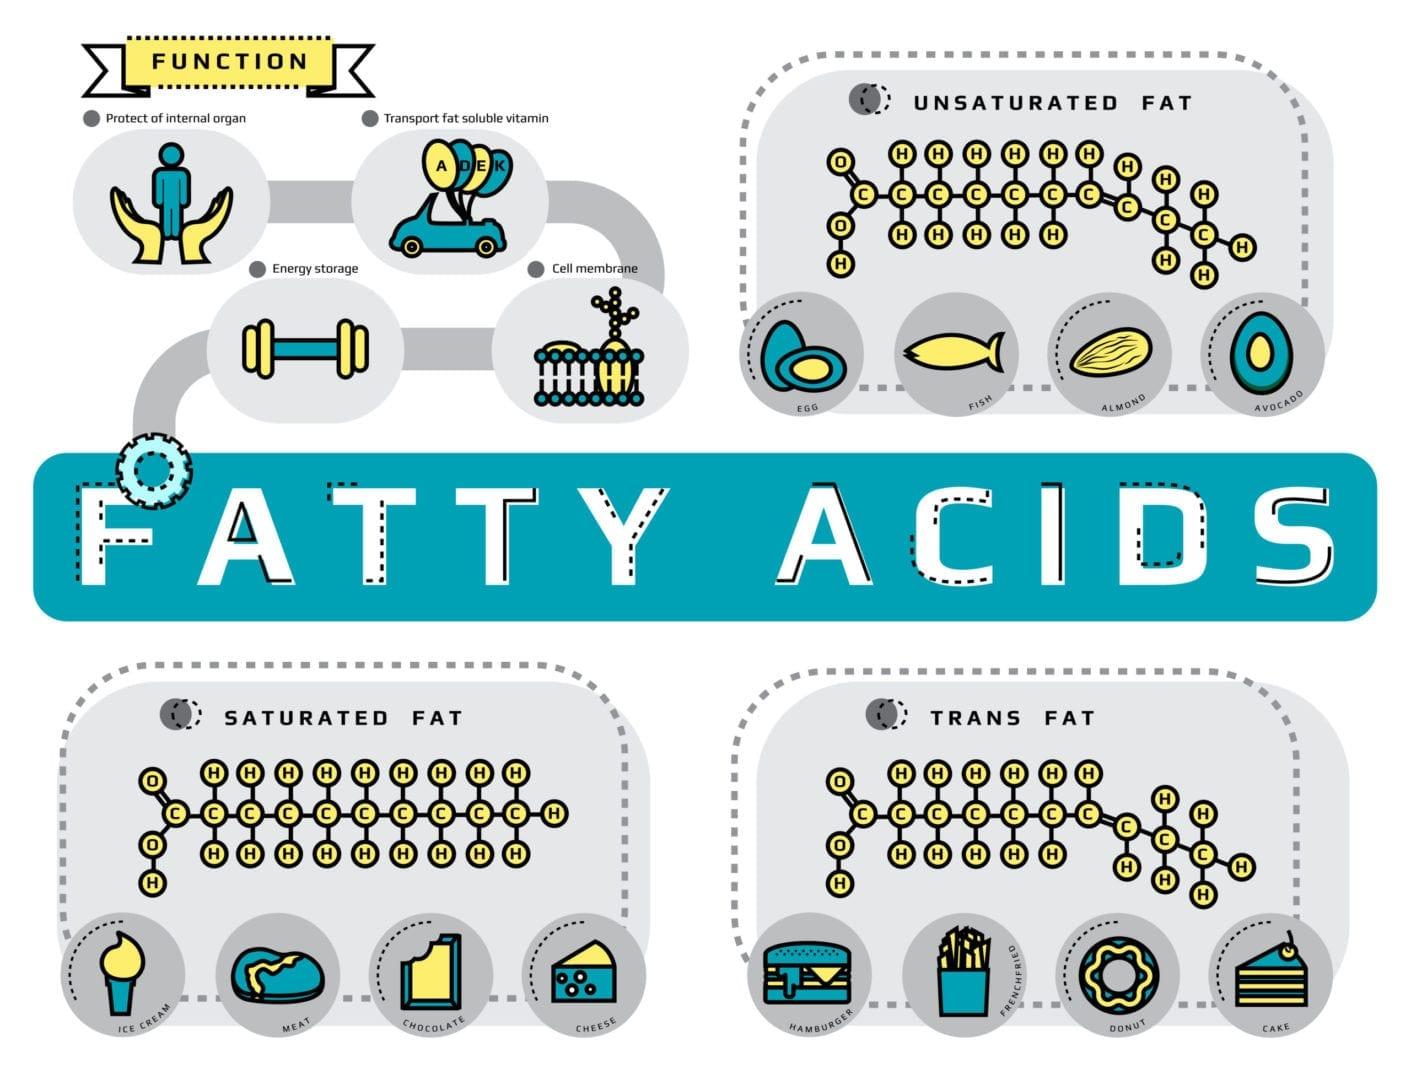 fatty acids trans fats